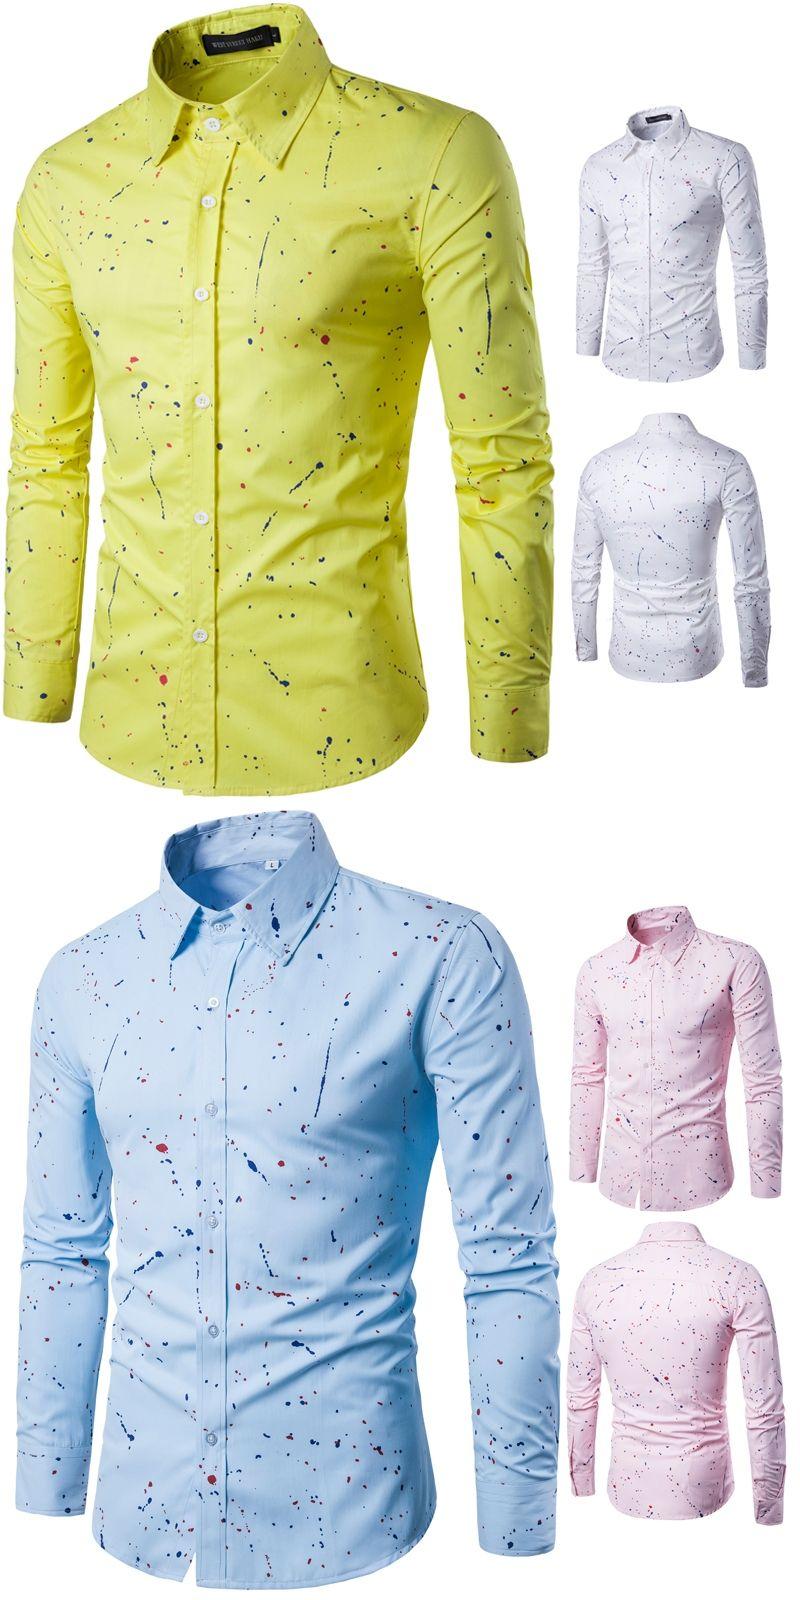 Brand fashion male shirt longsleeves tops printed floral mens